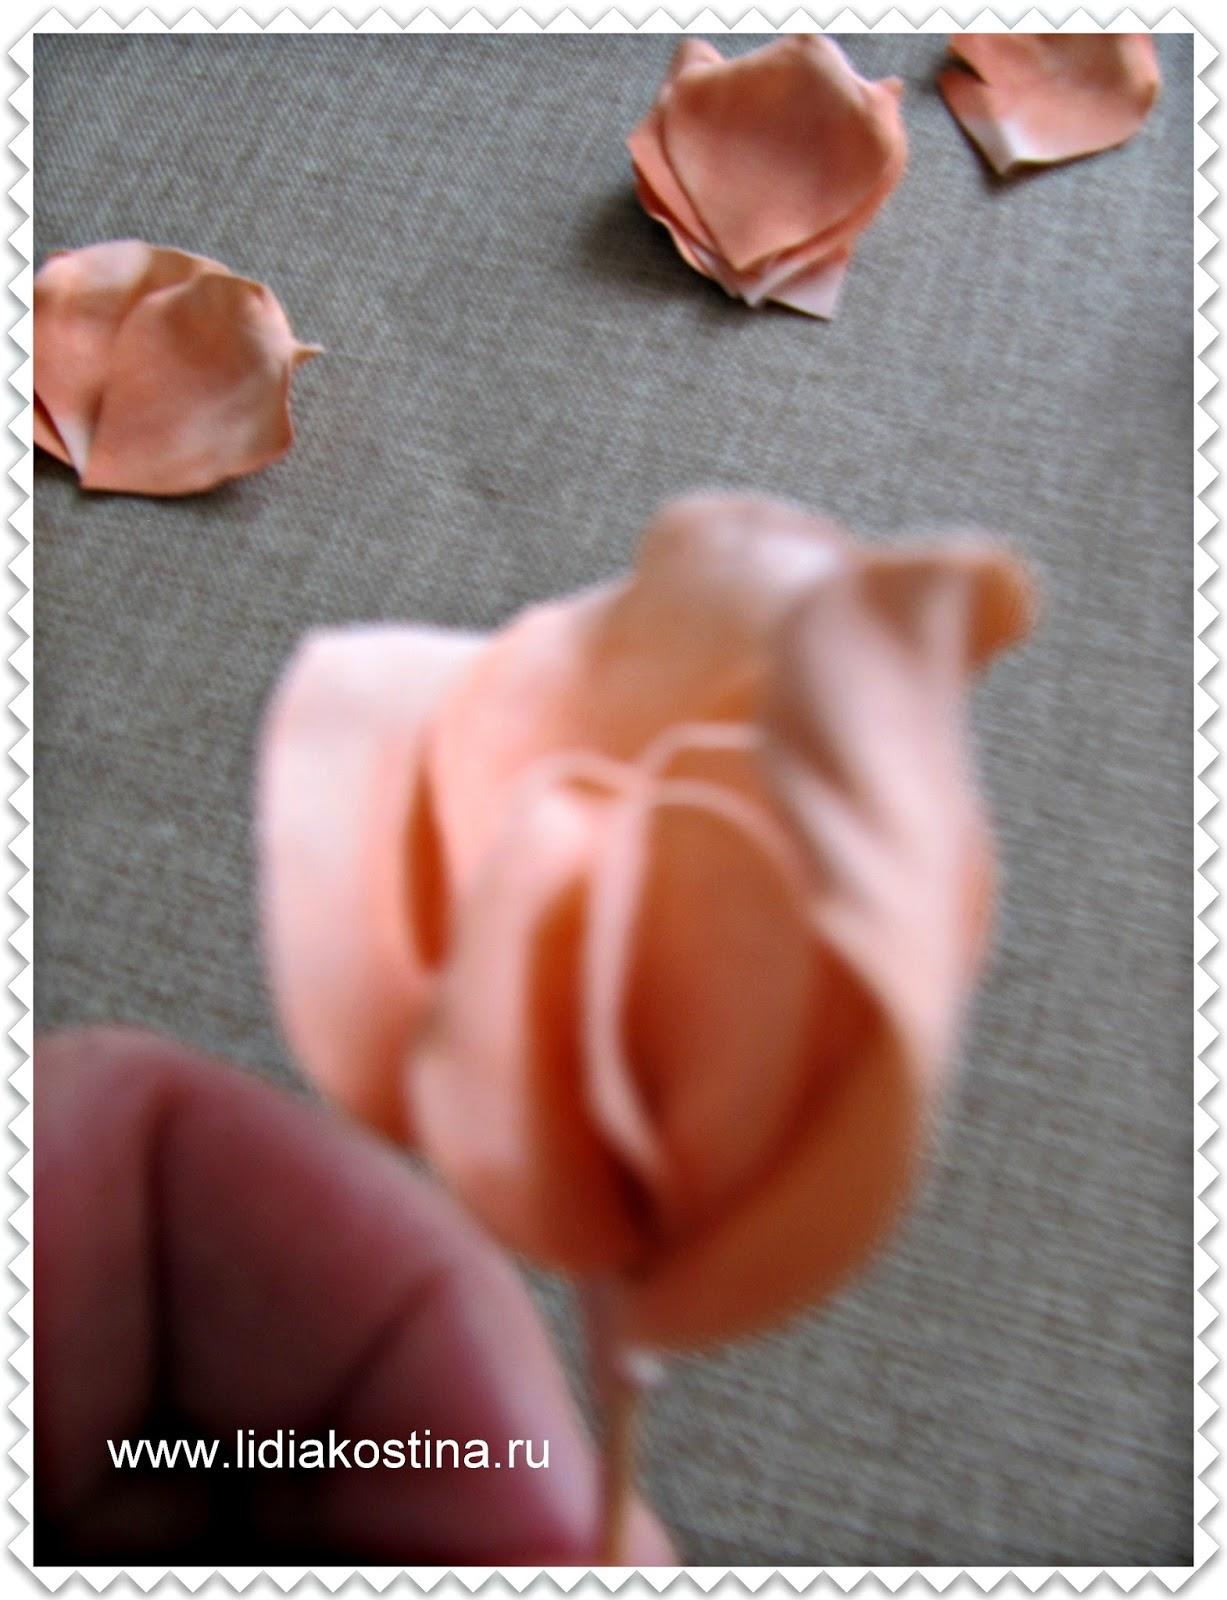 Цветок роза из фоамирана мастер класс с пошаговым фото